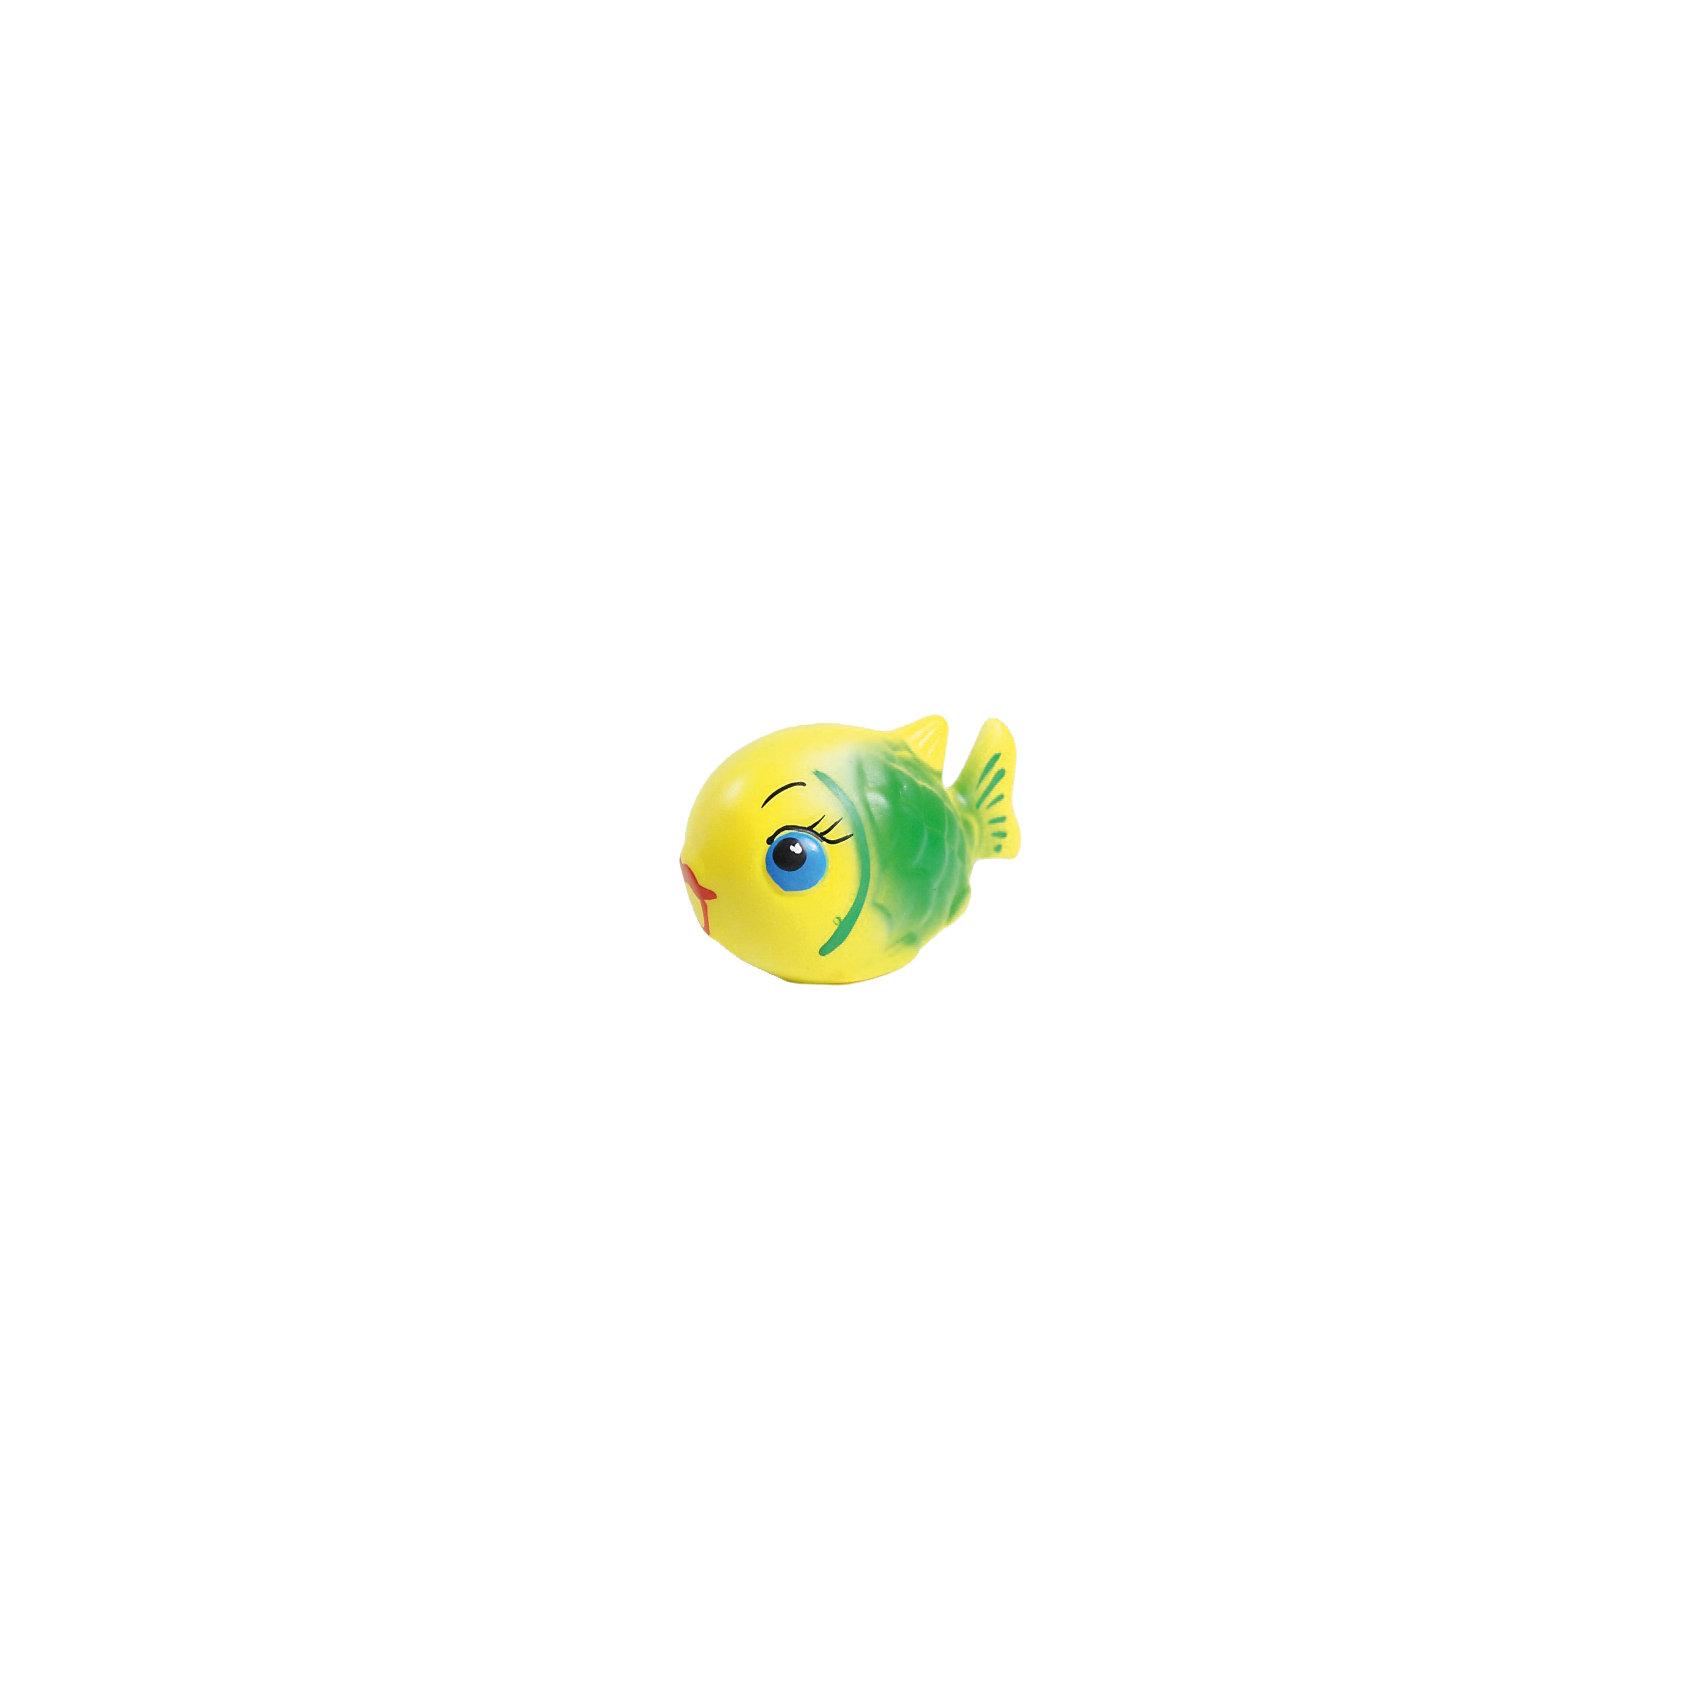 Рыбка Клоун, Кудесники<br><br>Ширина мм: 80<br>Глубина мм: 60<br>Высота мм: 55<br>Вес г: 40<br>Возраст от месяцев: 12<br>Возраст до месяцев: 36<br>Пол: Унисекс<br>Возраст: Детский<br>SKU: 4896451